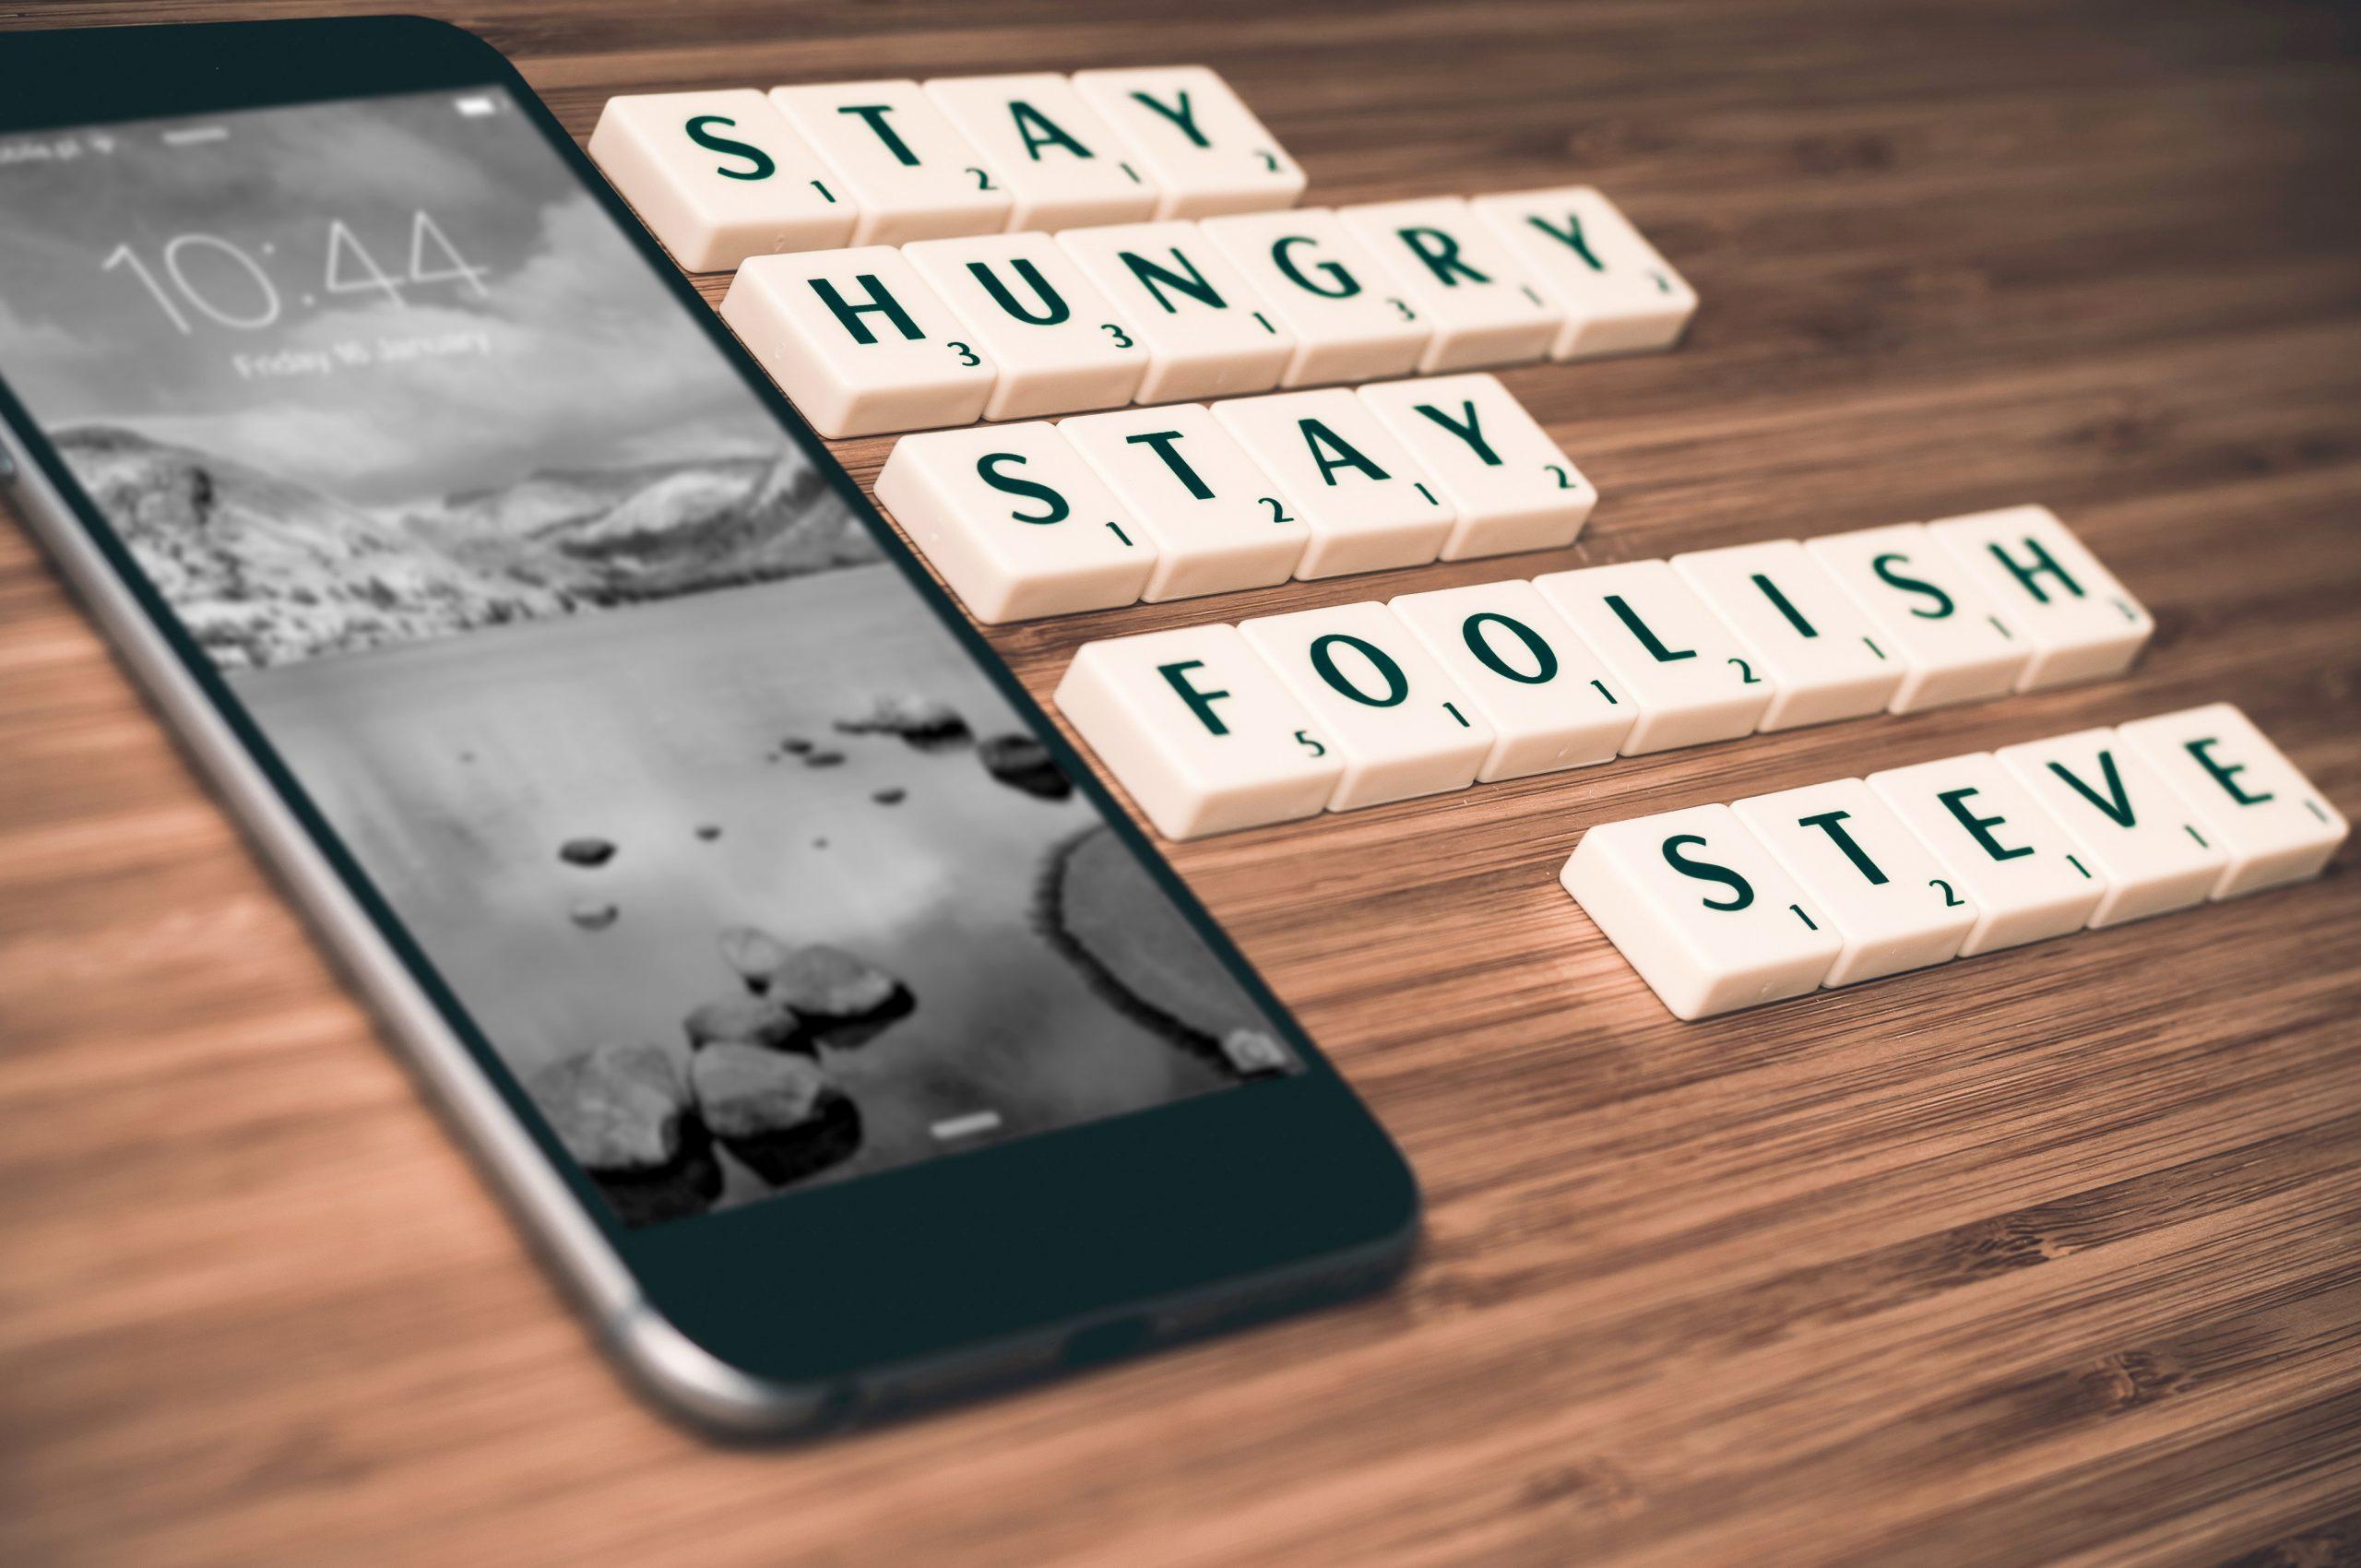 Steve Jobs Motto. Foto: Pixabay